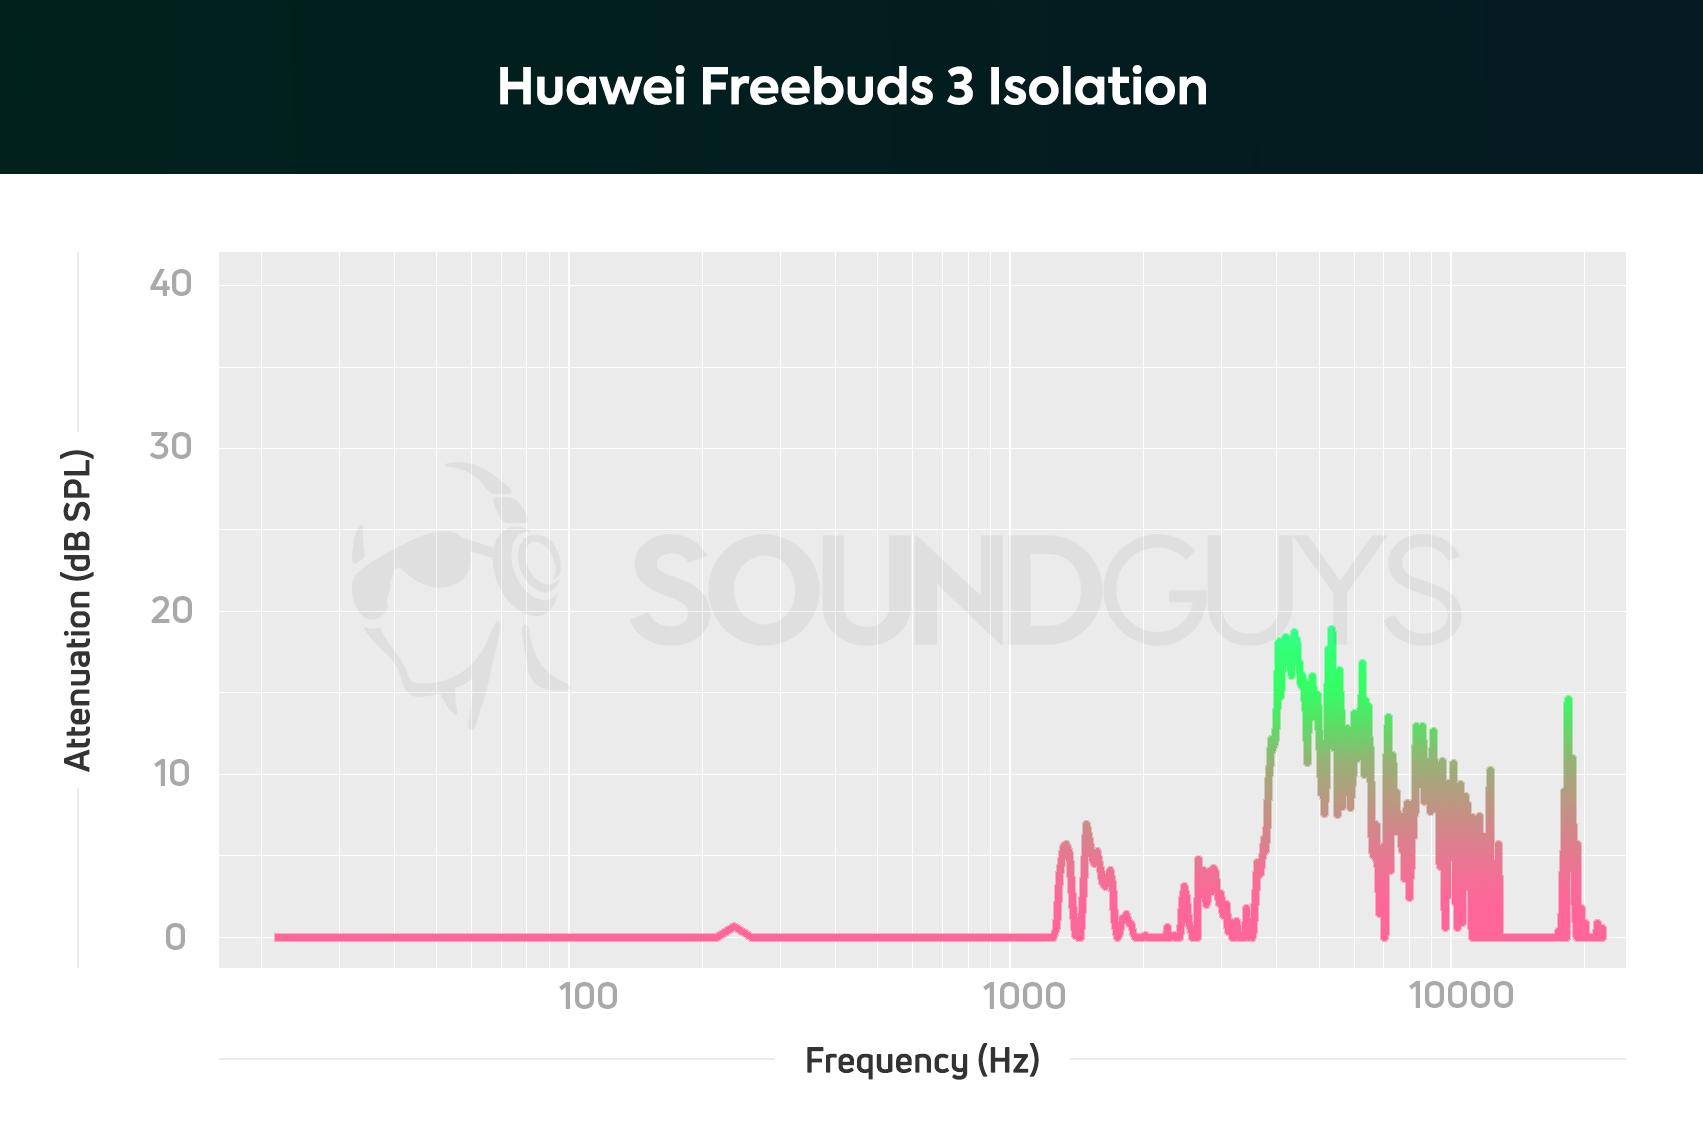 Huawei Freebuds 3 Isolation Graph